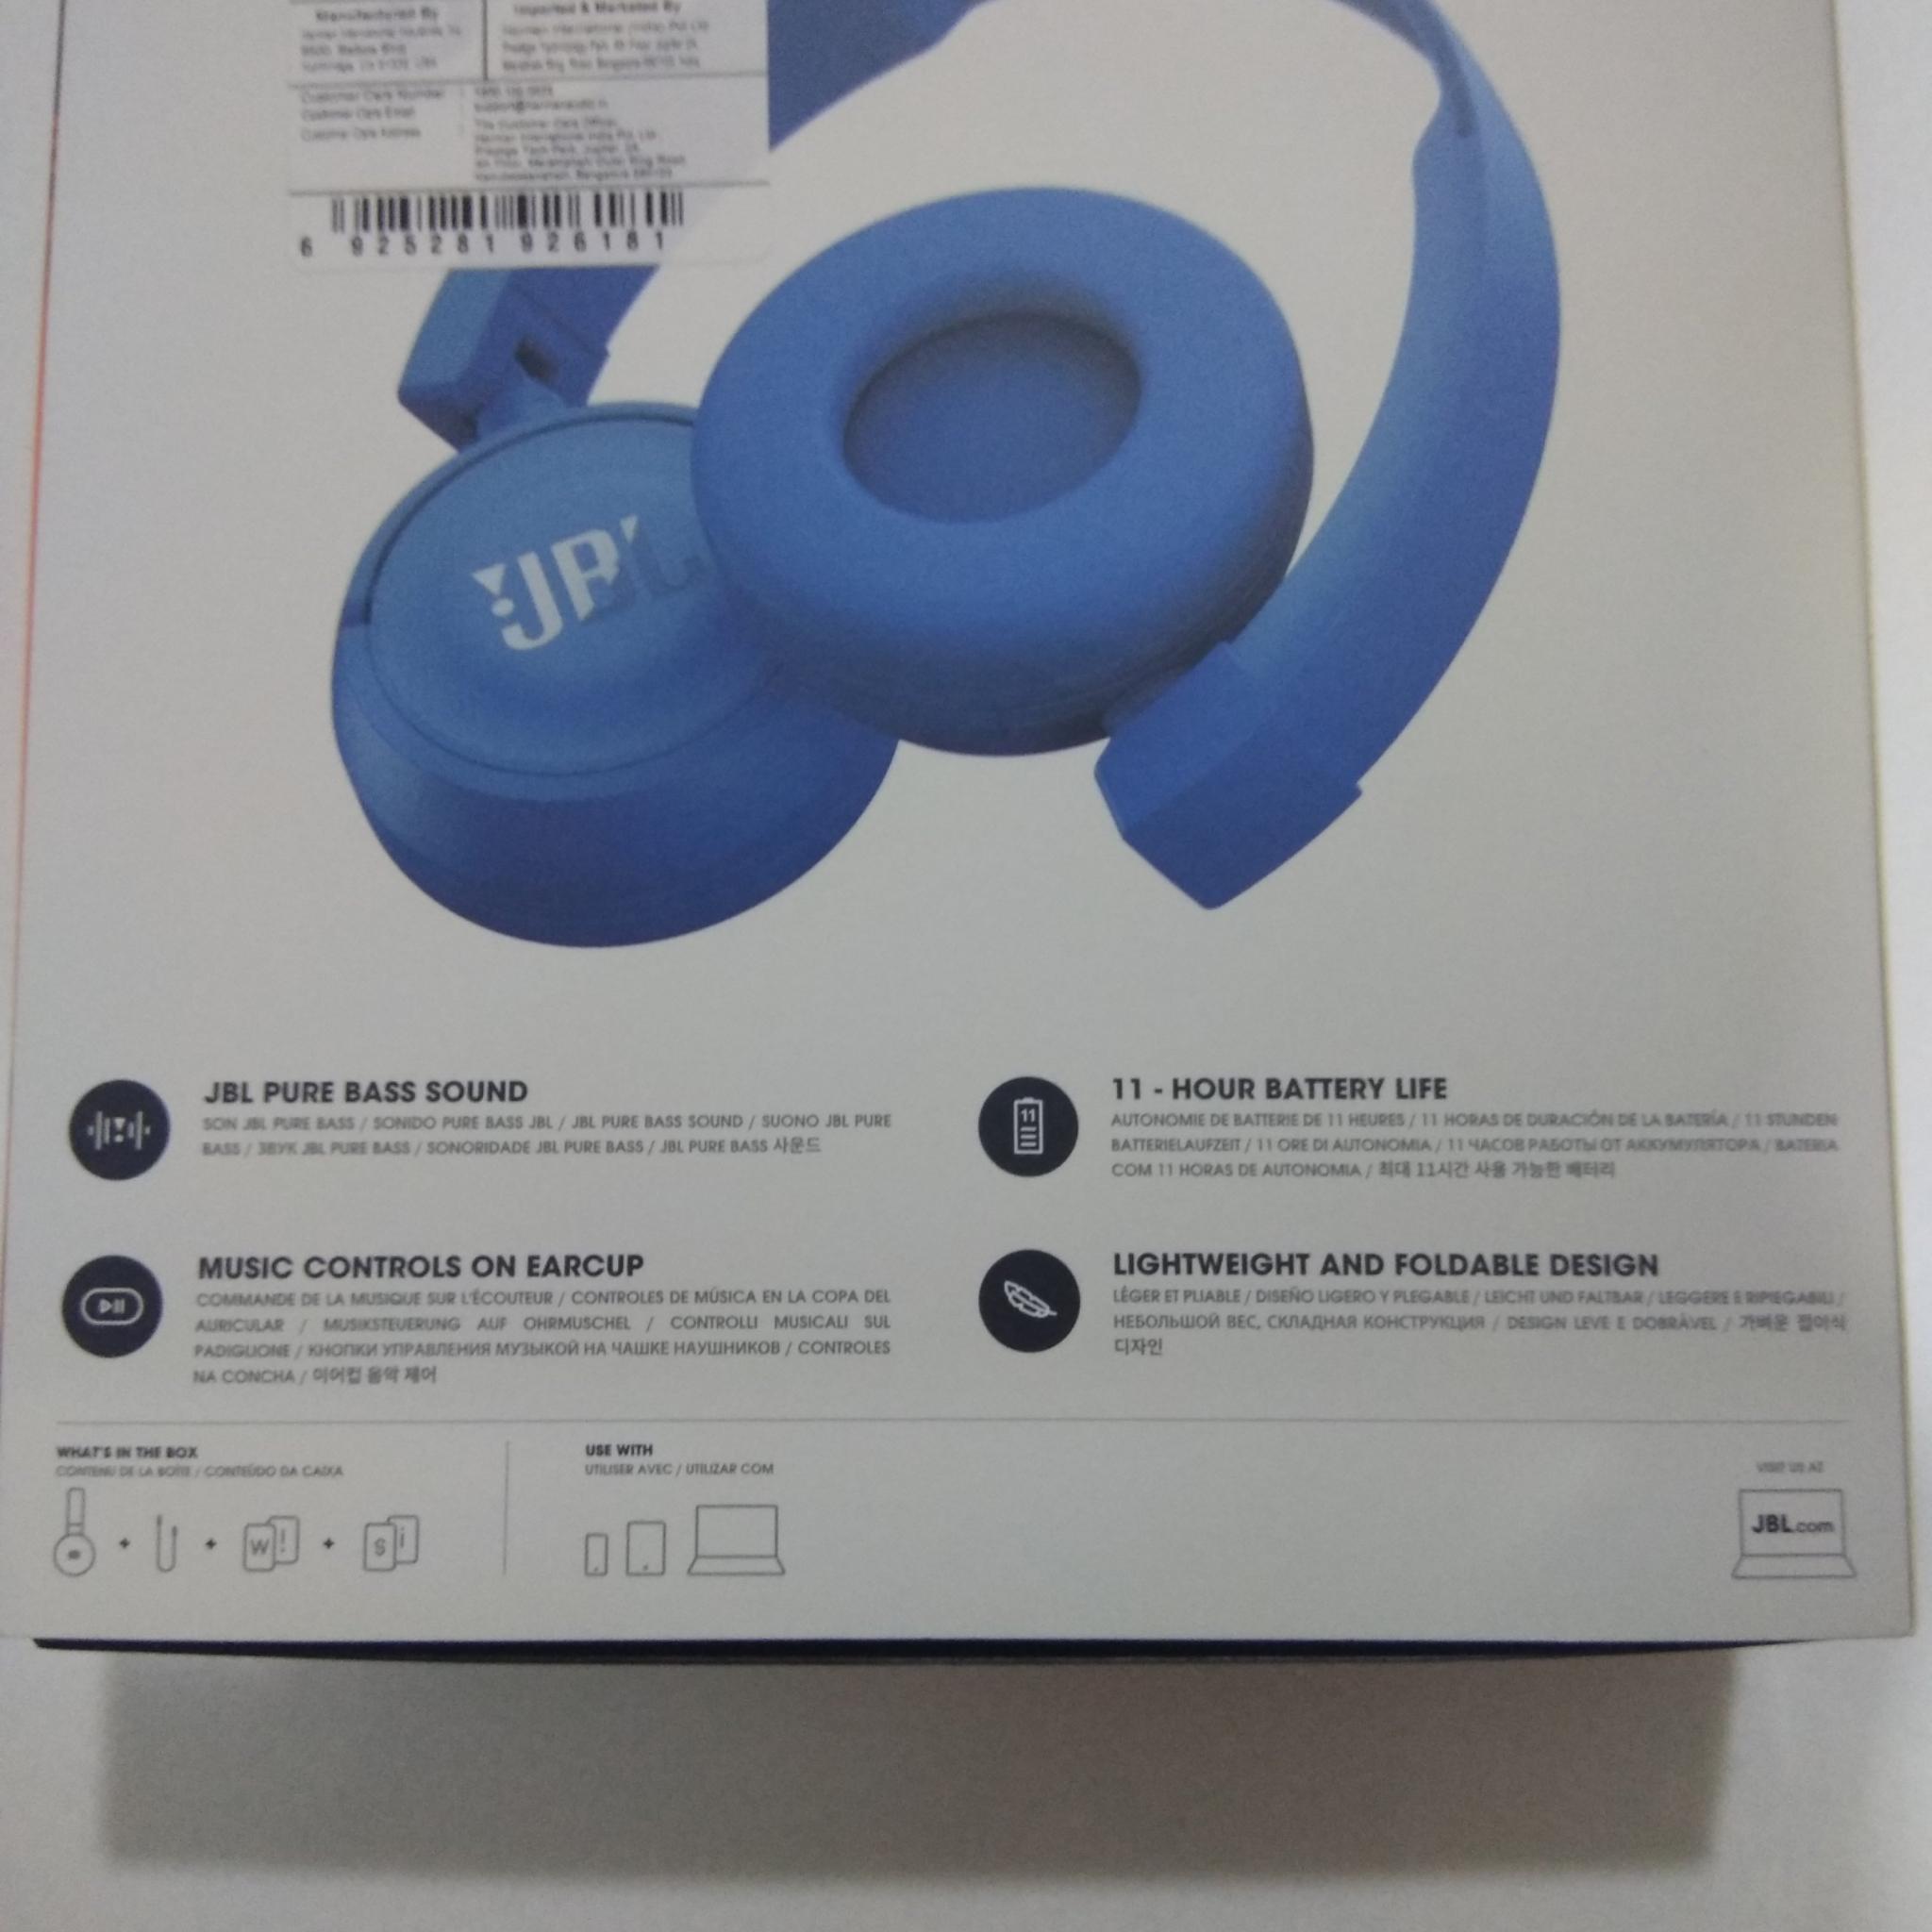 JBL T460BT Wireless Bluetooth on-ear headphones, Blue, Rs 2400